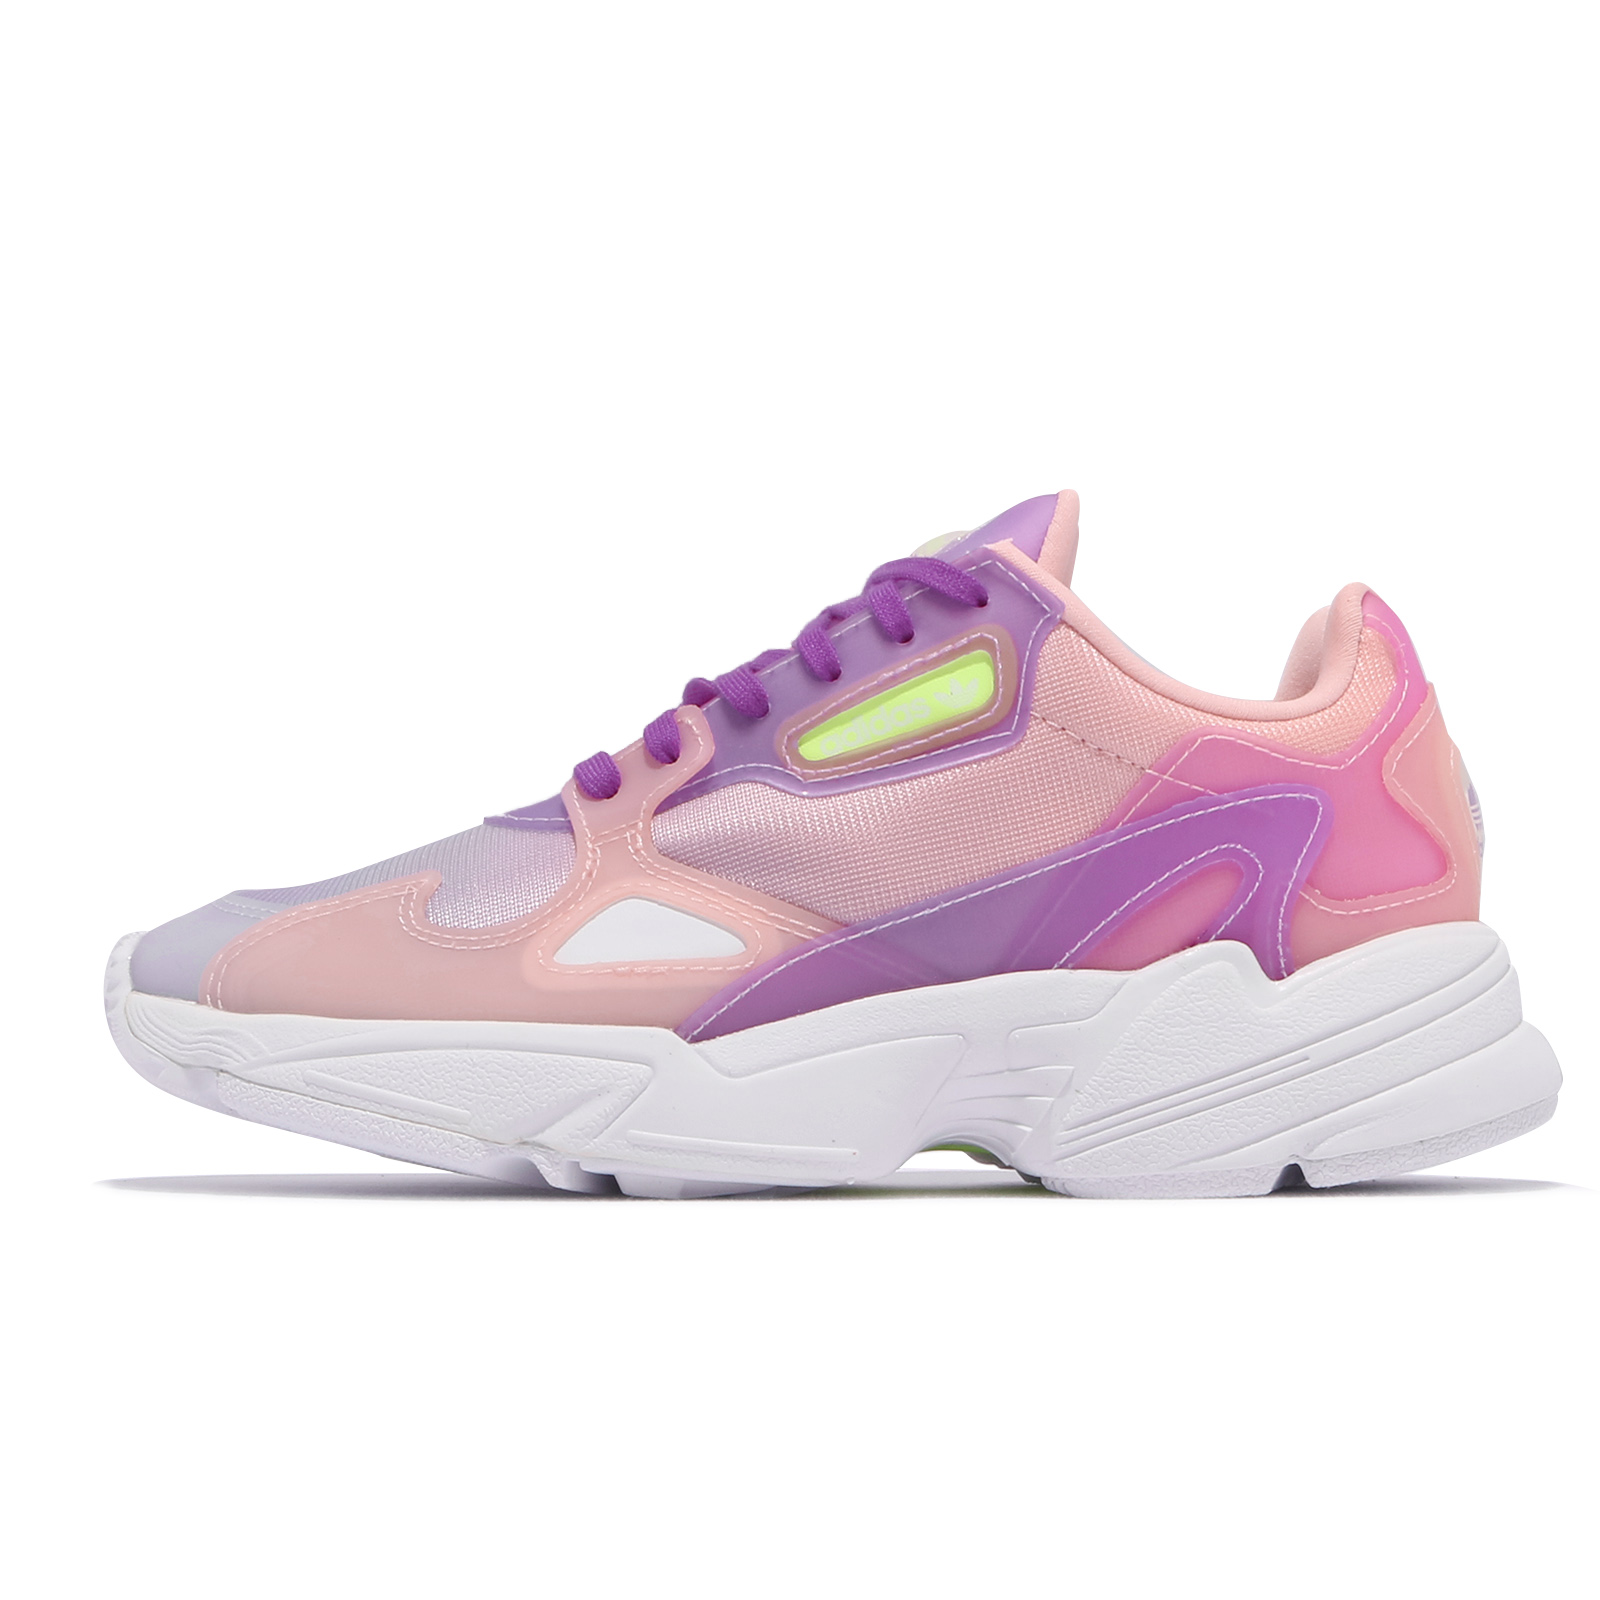 adidas 休閒鞋 Falcon W 紫 粉紫 女鞋 漸層 老爹鞋 三葉草 愛迪達 【ACS】 FW2486